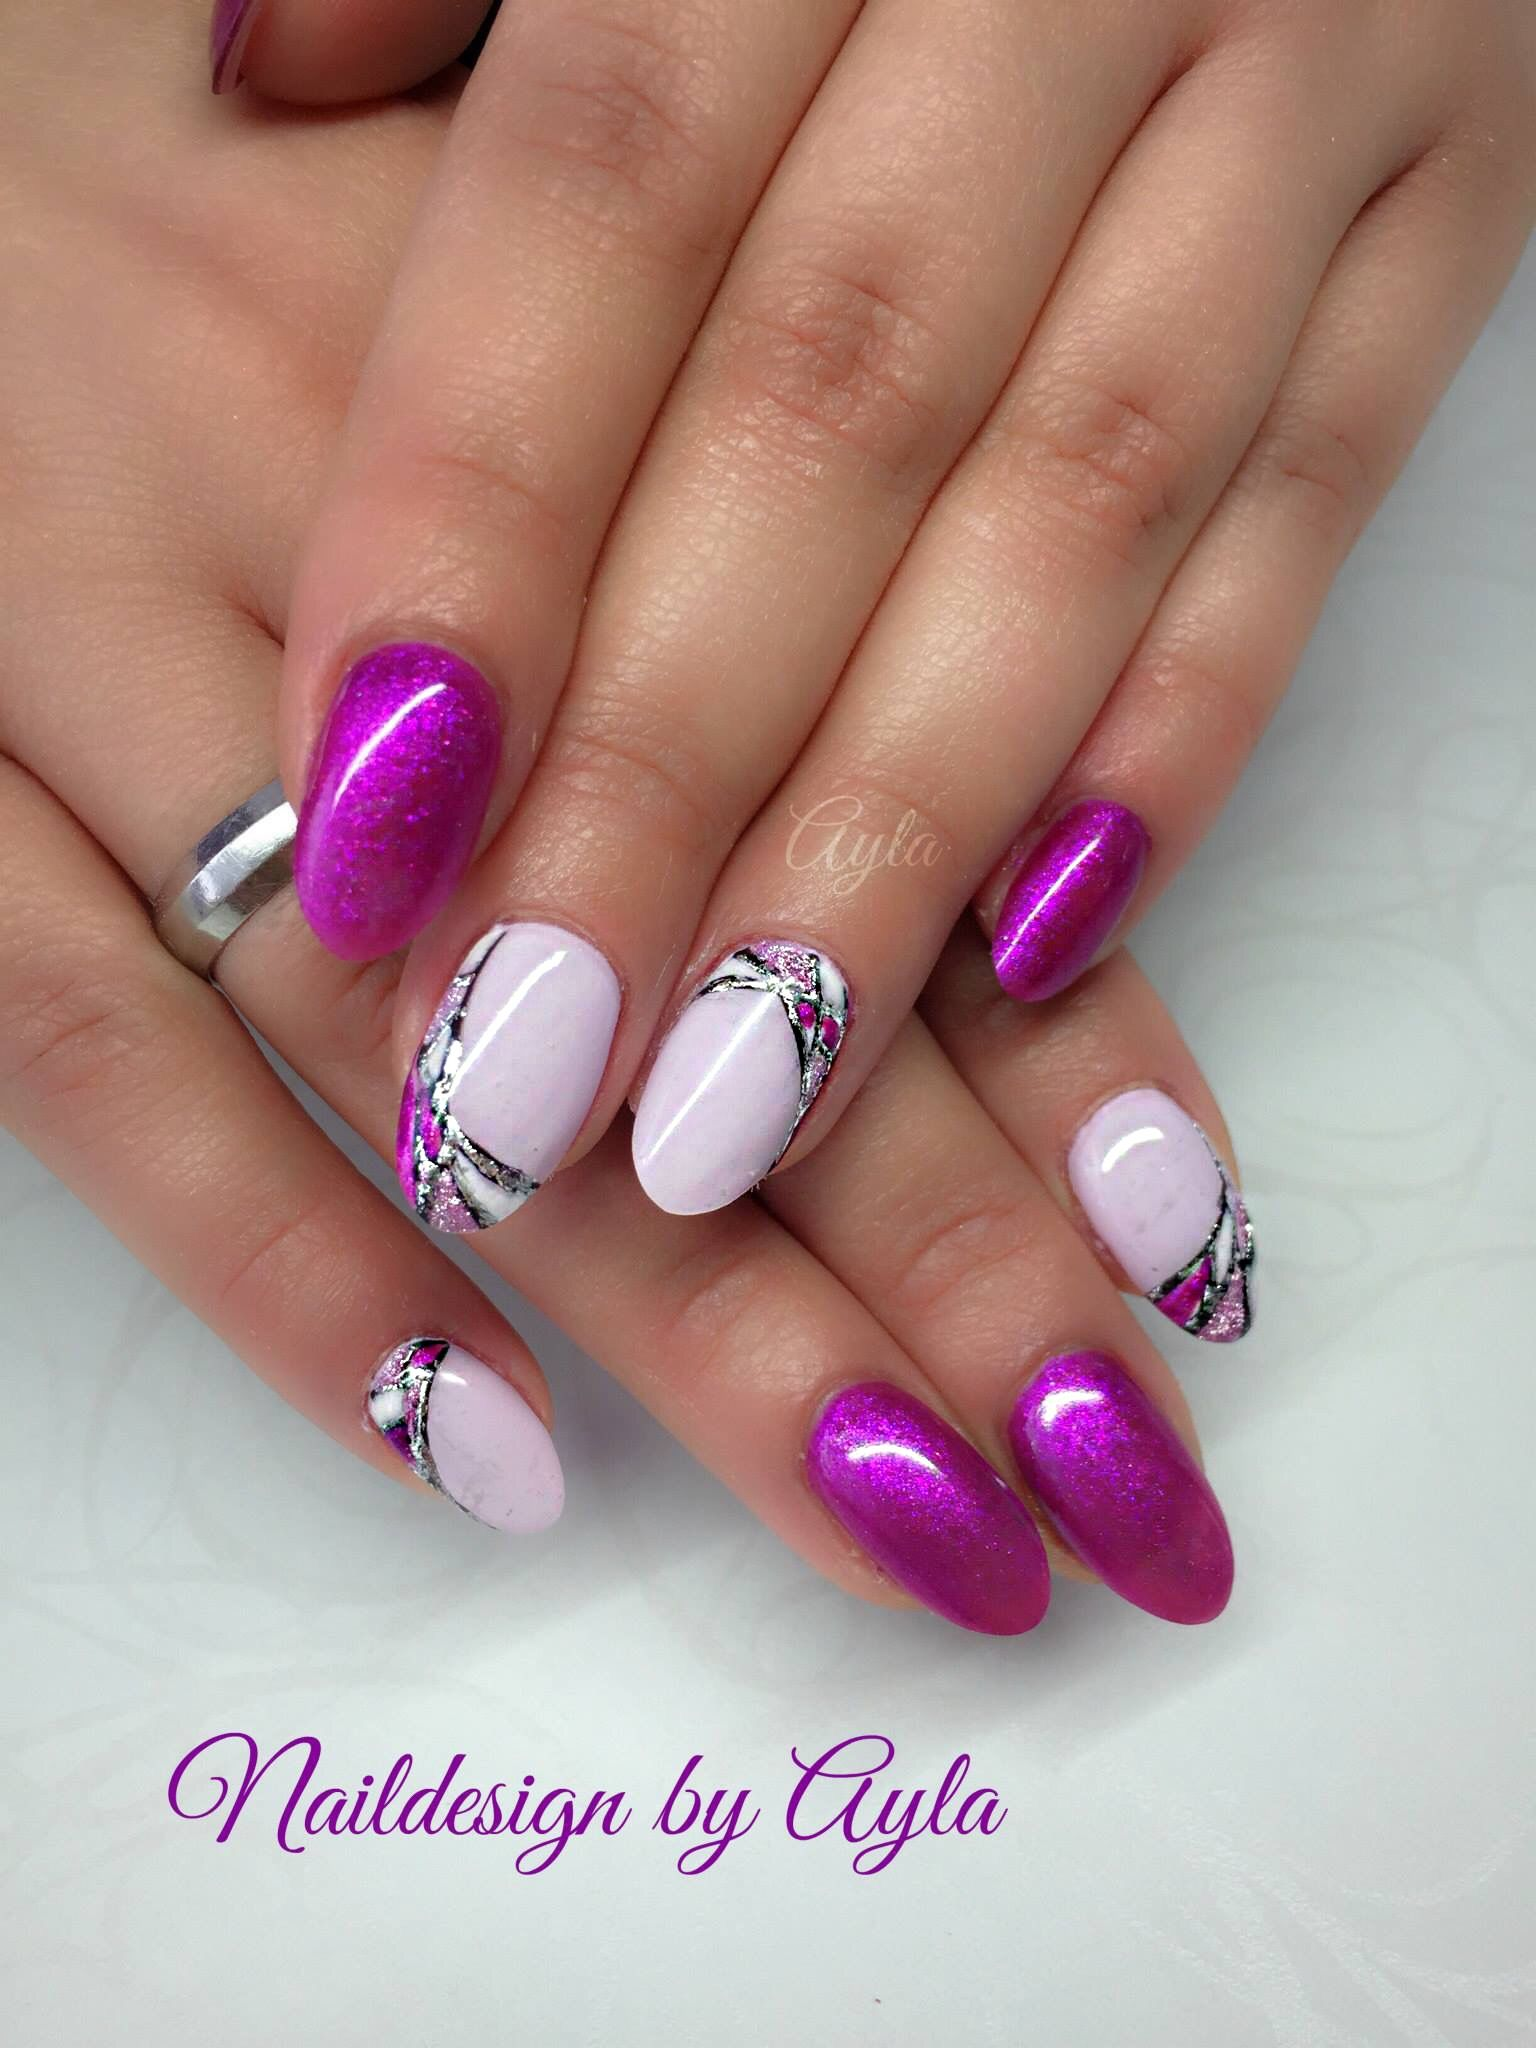 Pin by Oksana on маникюр | Pinterest | Manicure, Art nails and ...